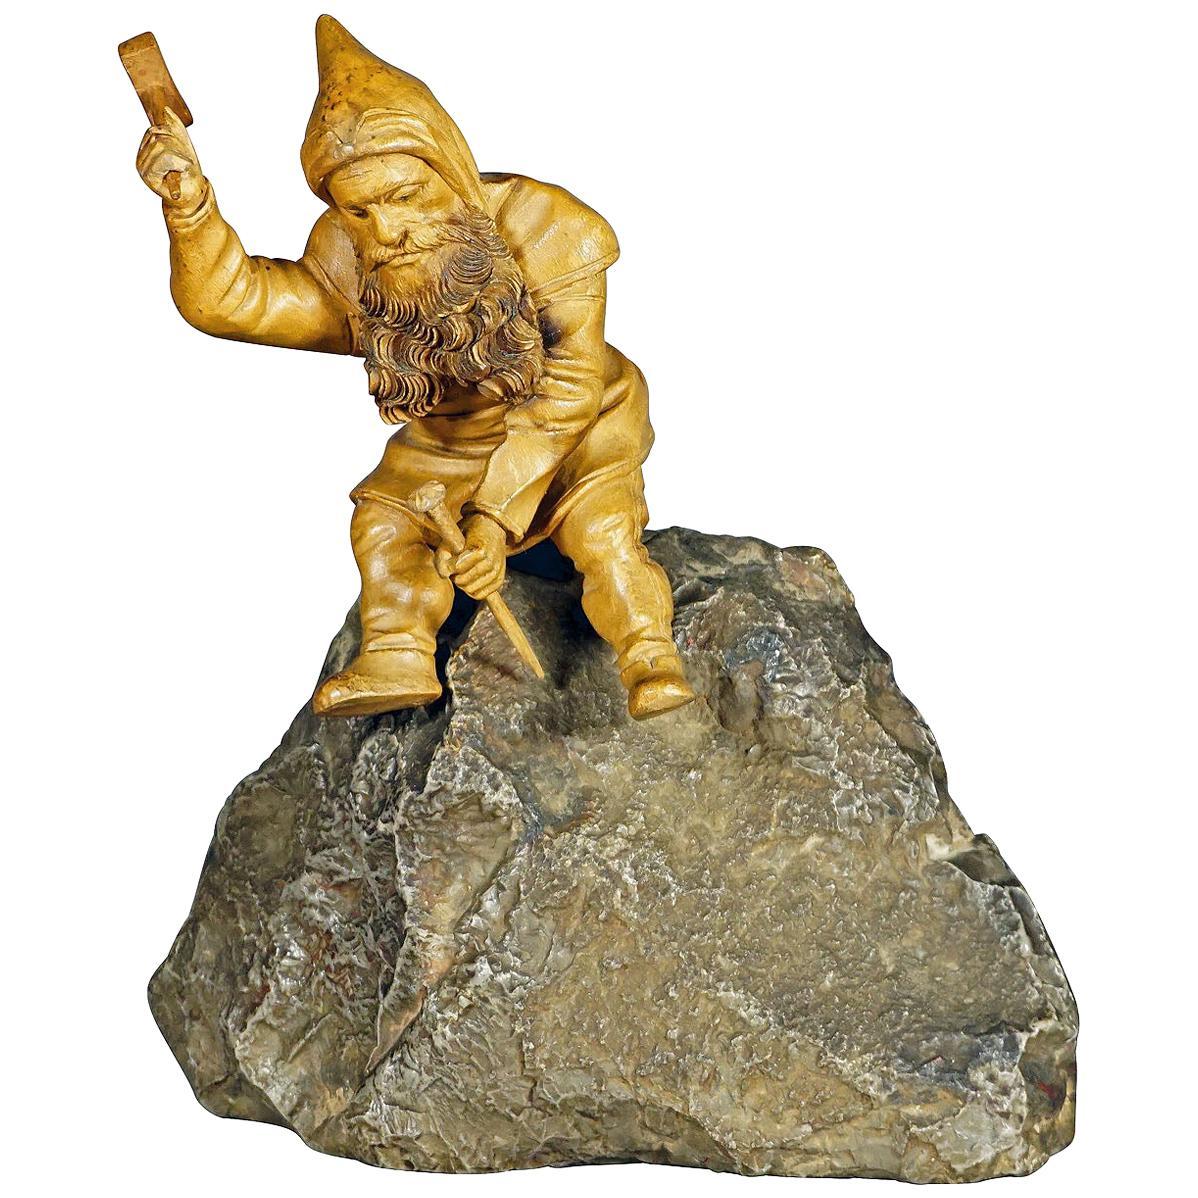 Wooden Carved Black Forest Dwarf Sitting on a Rock